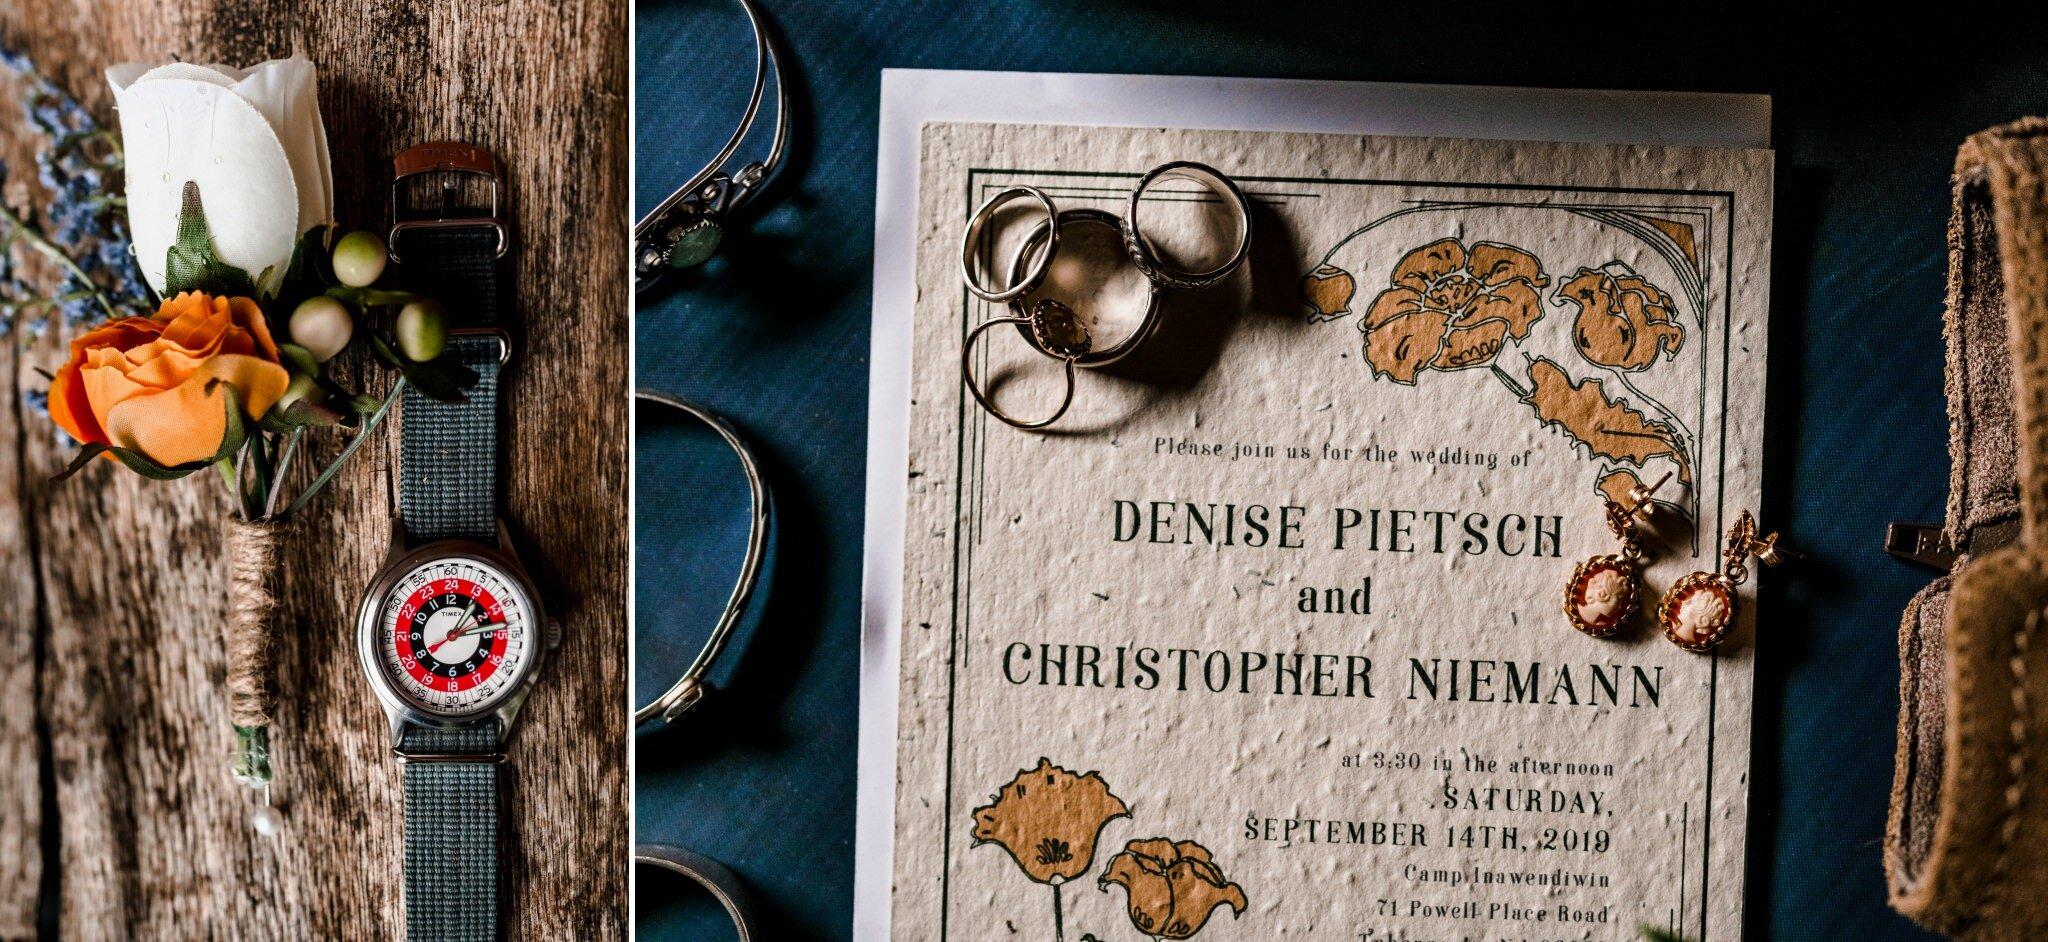 Niemann-Camp-Inawendiwin-New-Jersey-Wedding-Photographer-40.JPG